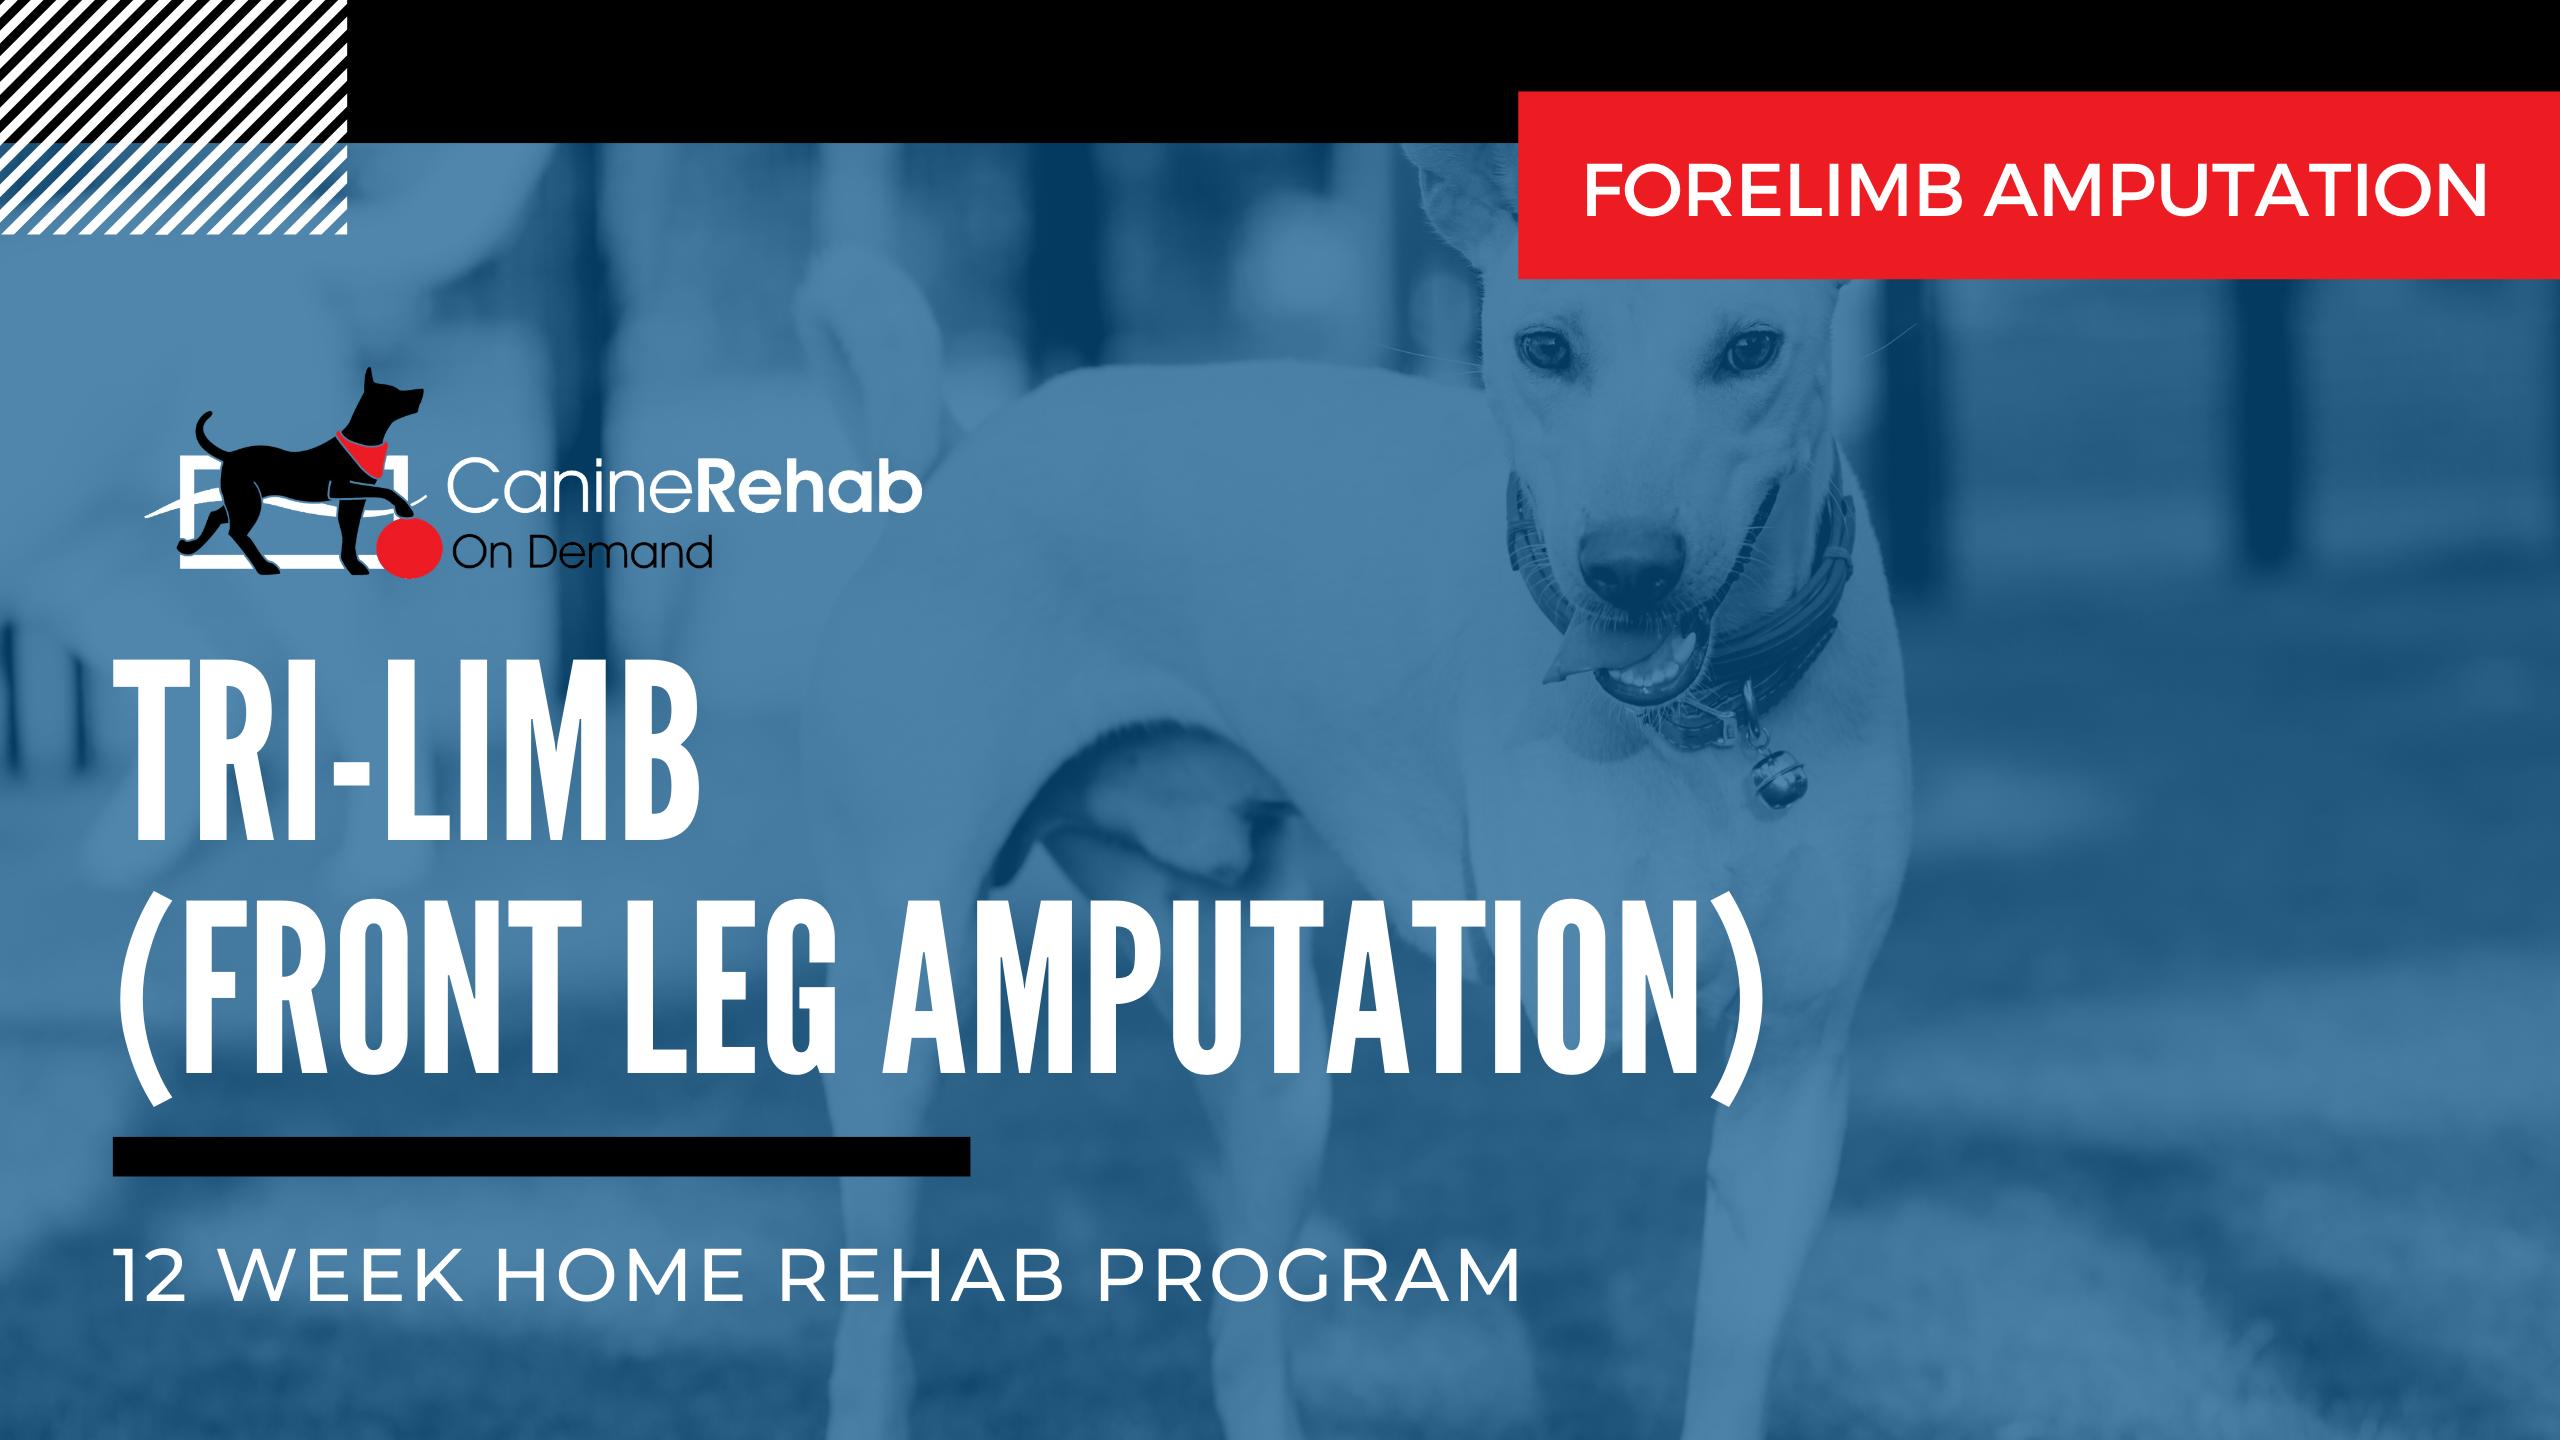 12-Week Home Rehab Program for Front Leg Amputation